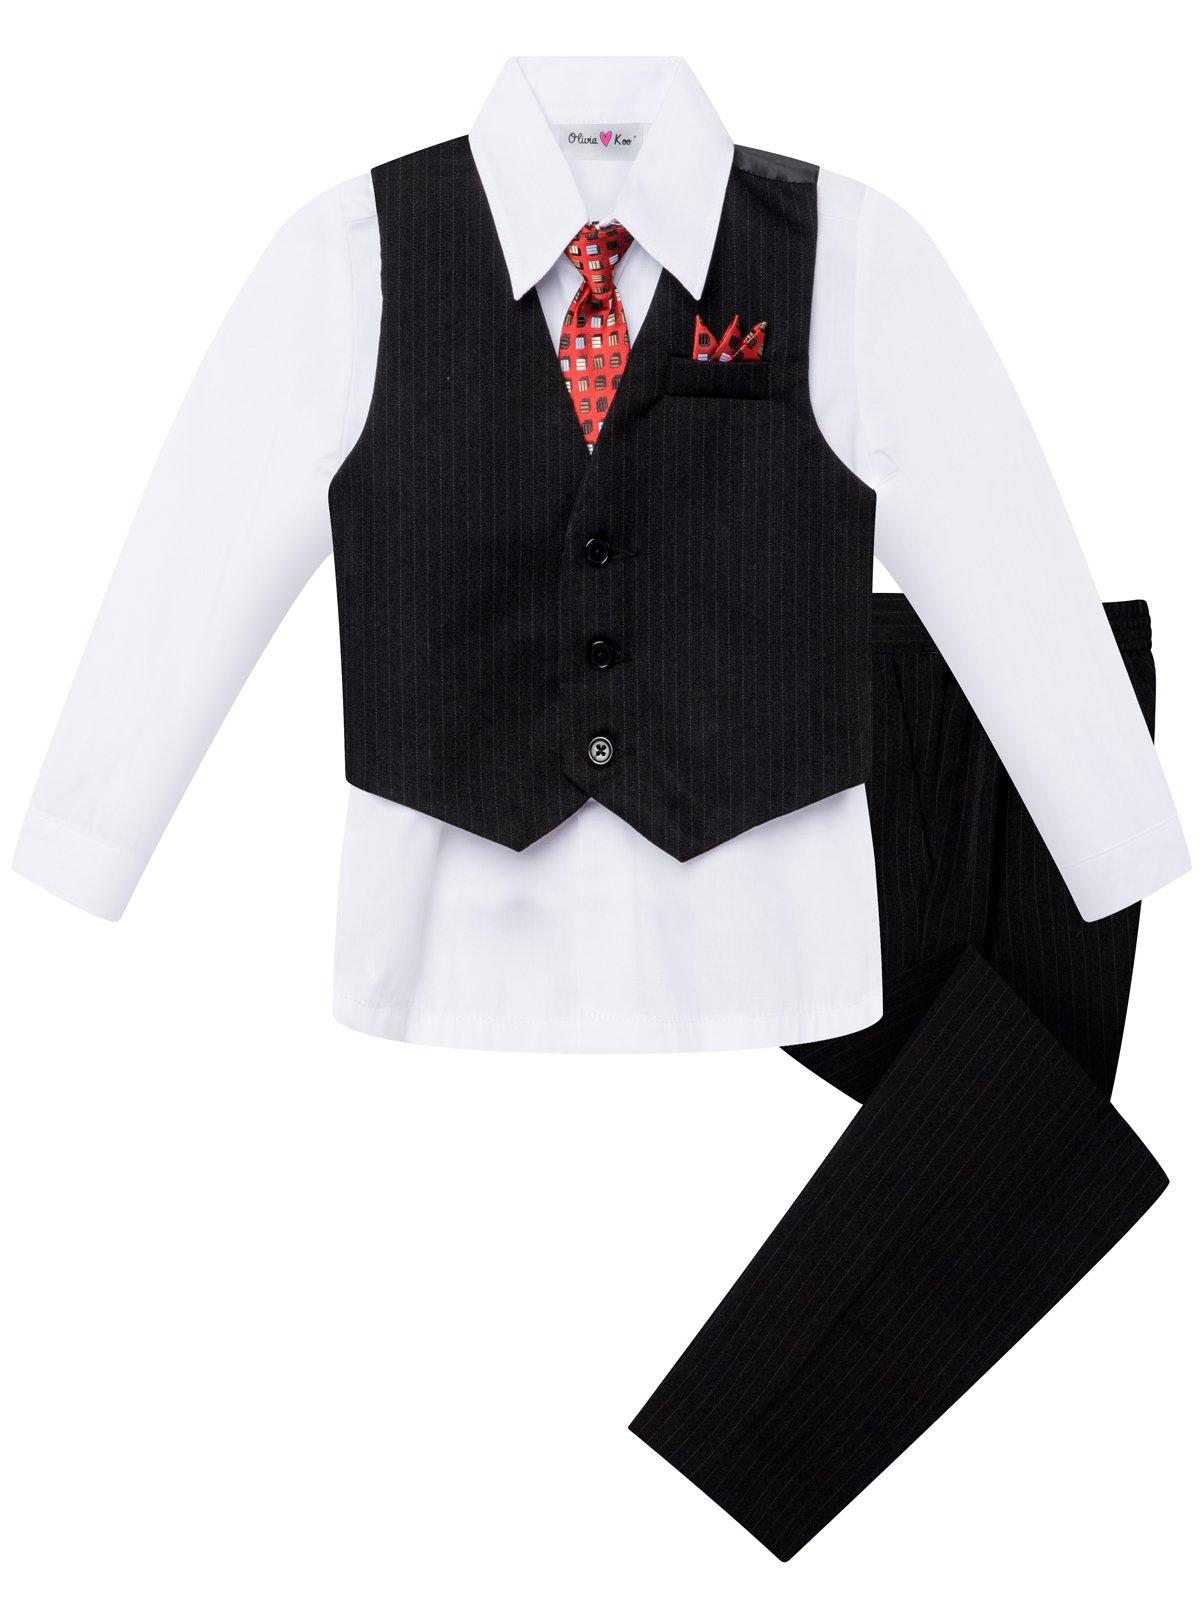 OLIVIA KOO Boys Colored Shirt Pinstripe 4 Piece Pinstriped Vest Set ,01 White,8